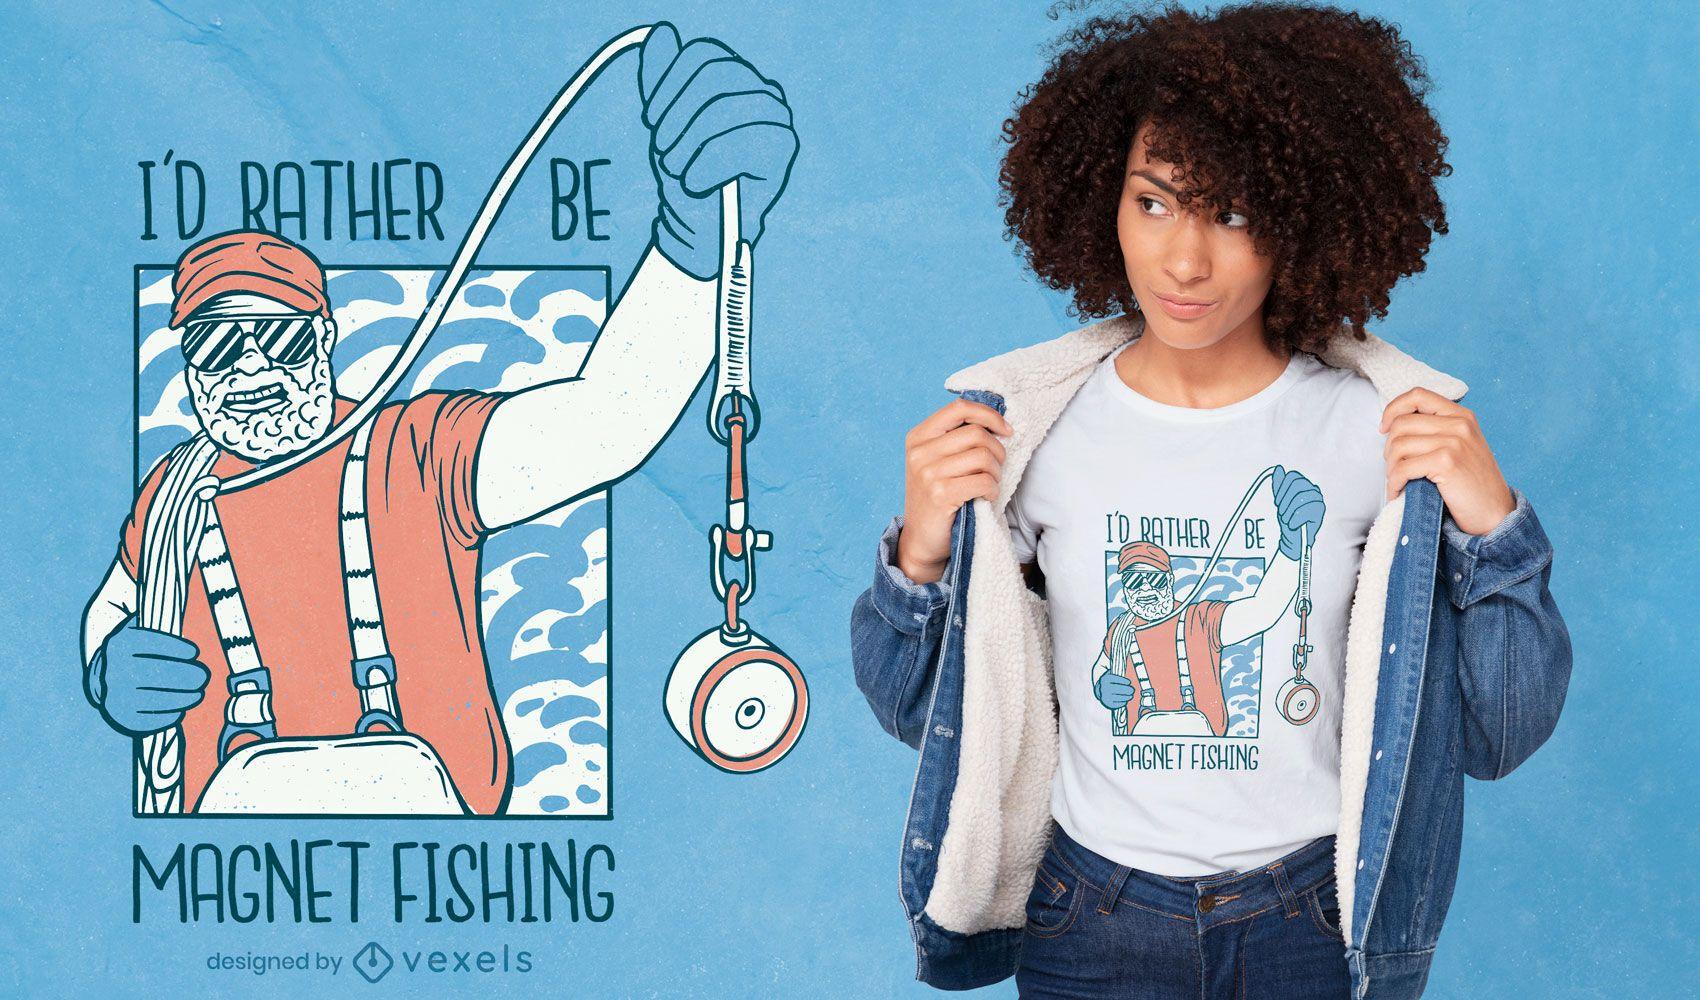 Magnetfischen T-Shirt Design